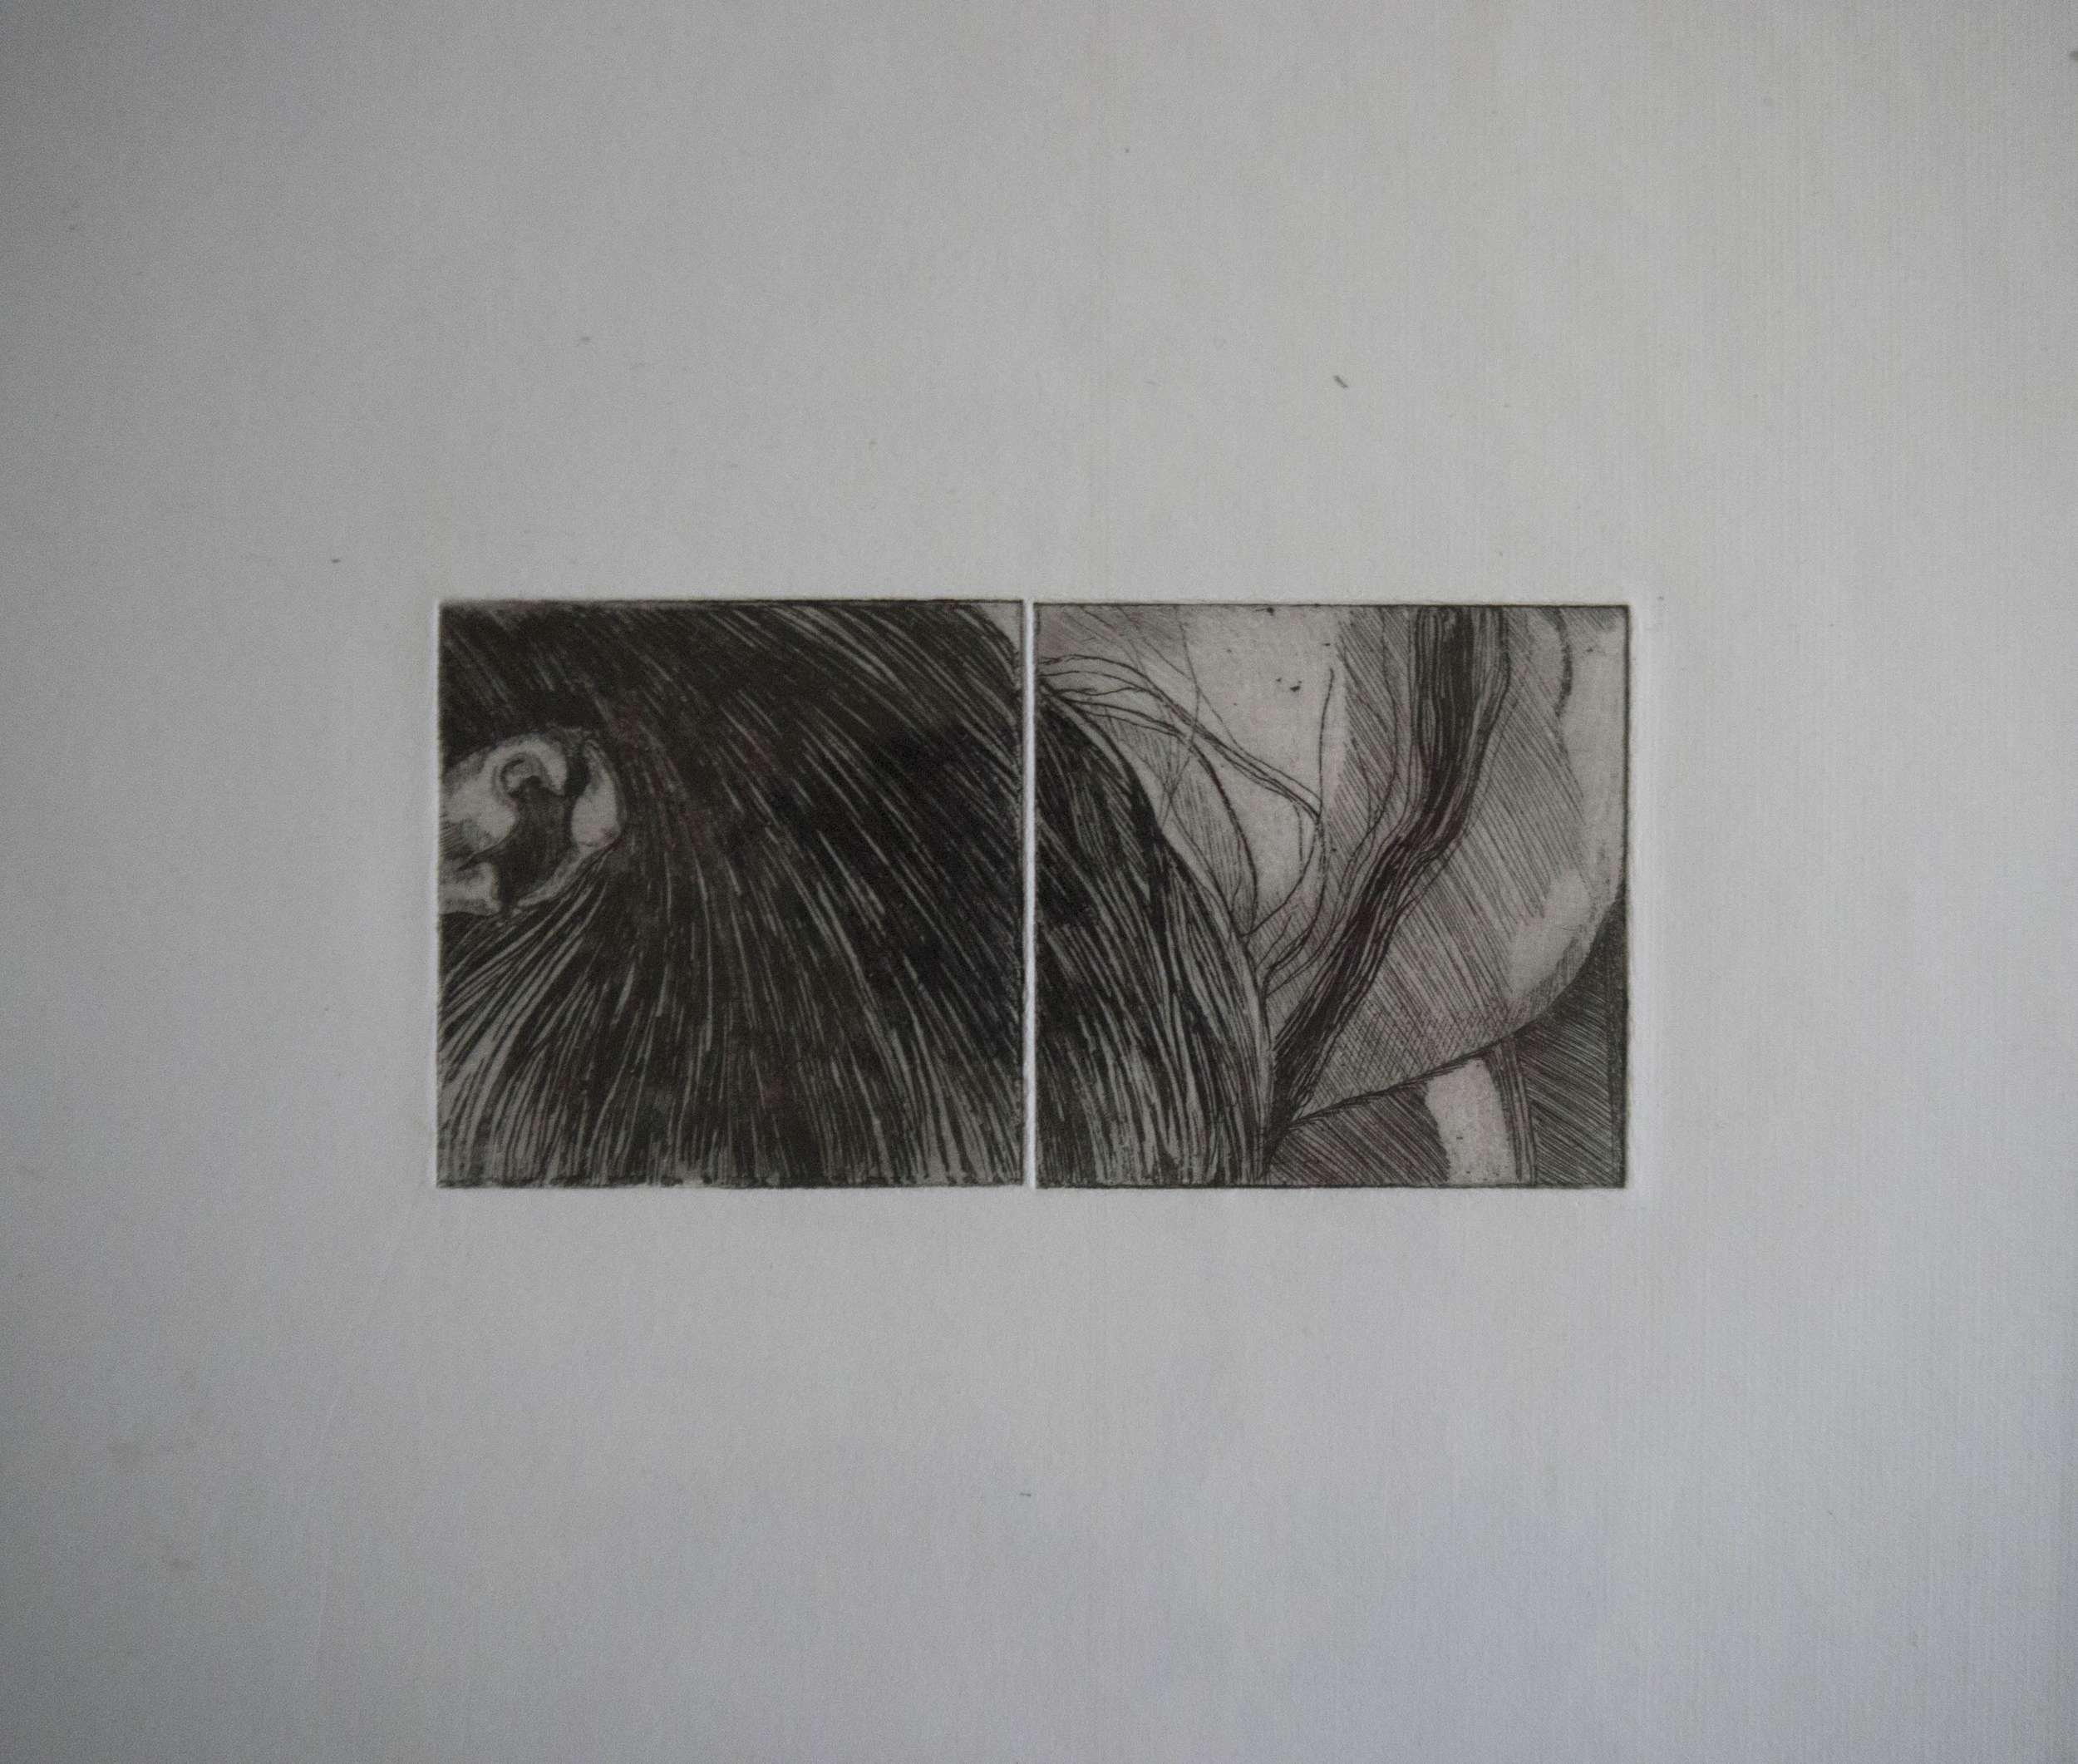 Code 5C, Code 6C Hair&EarSQ Image